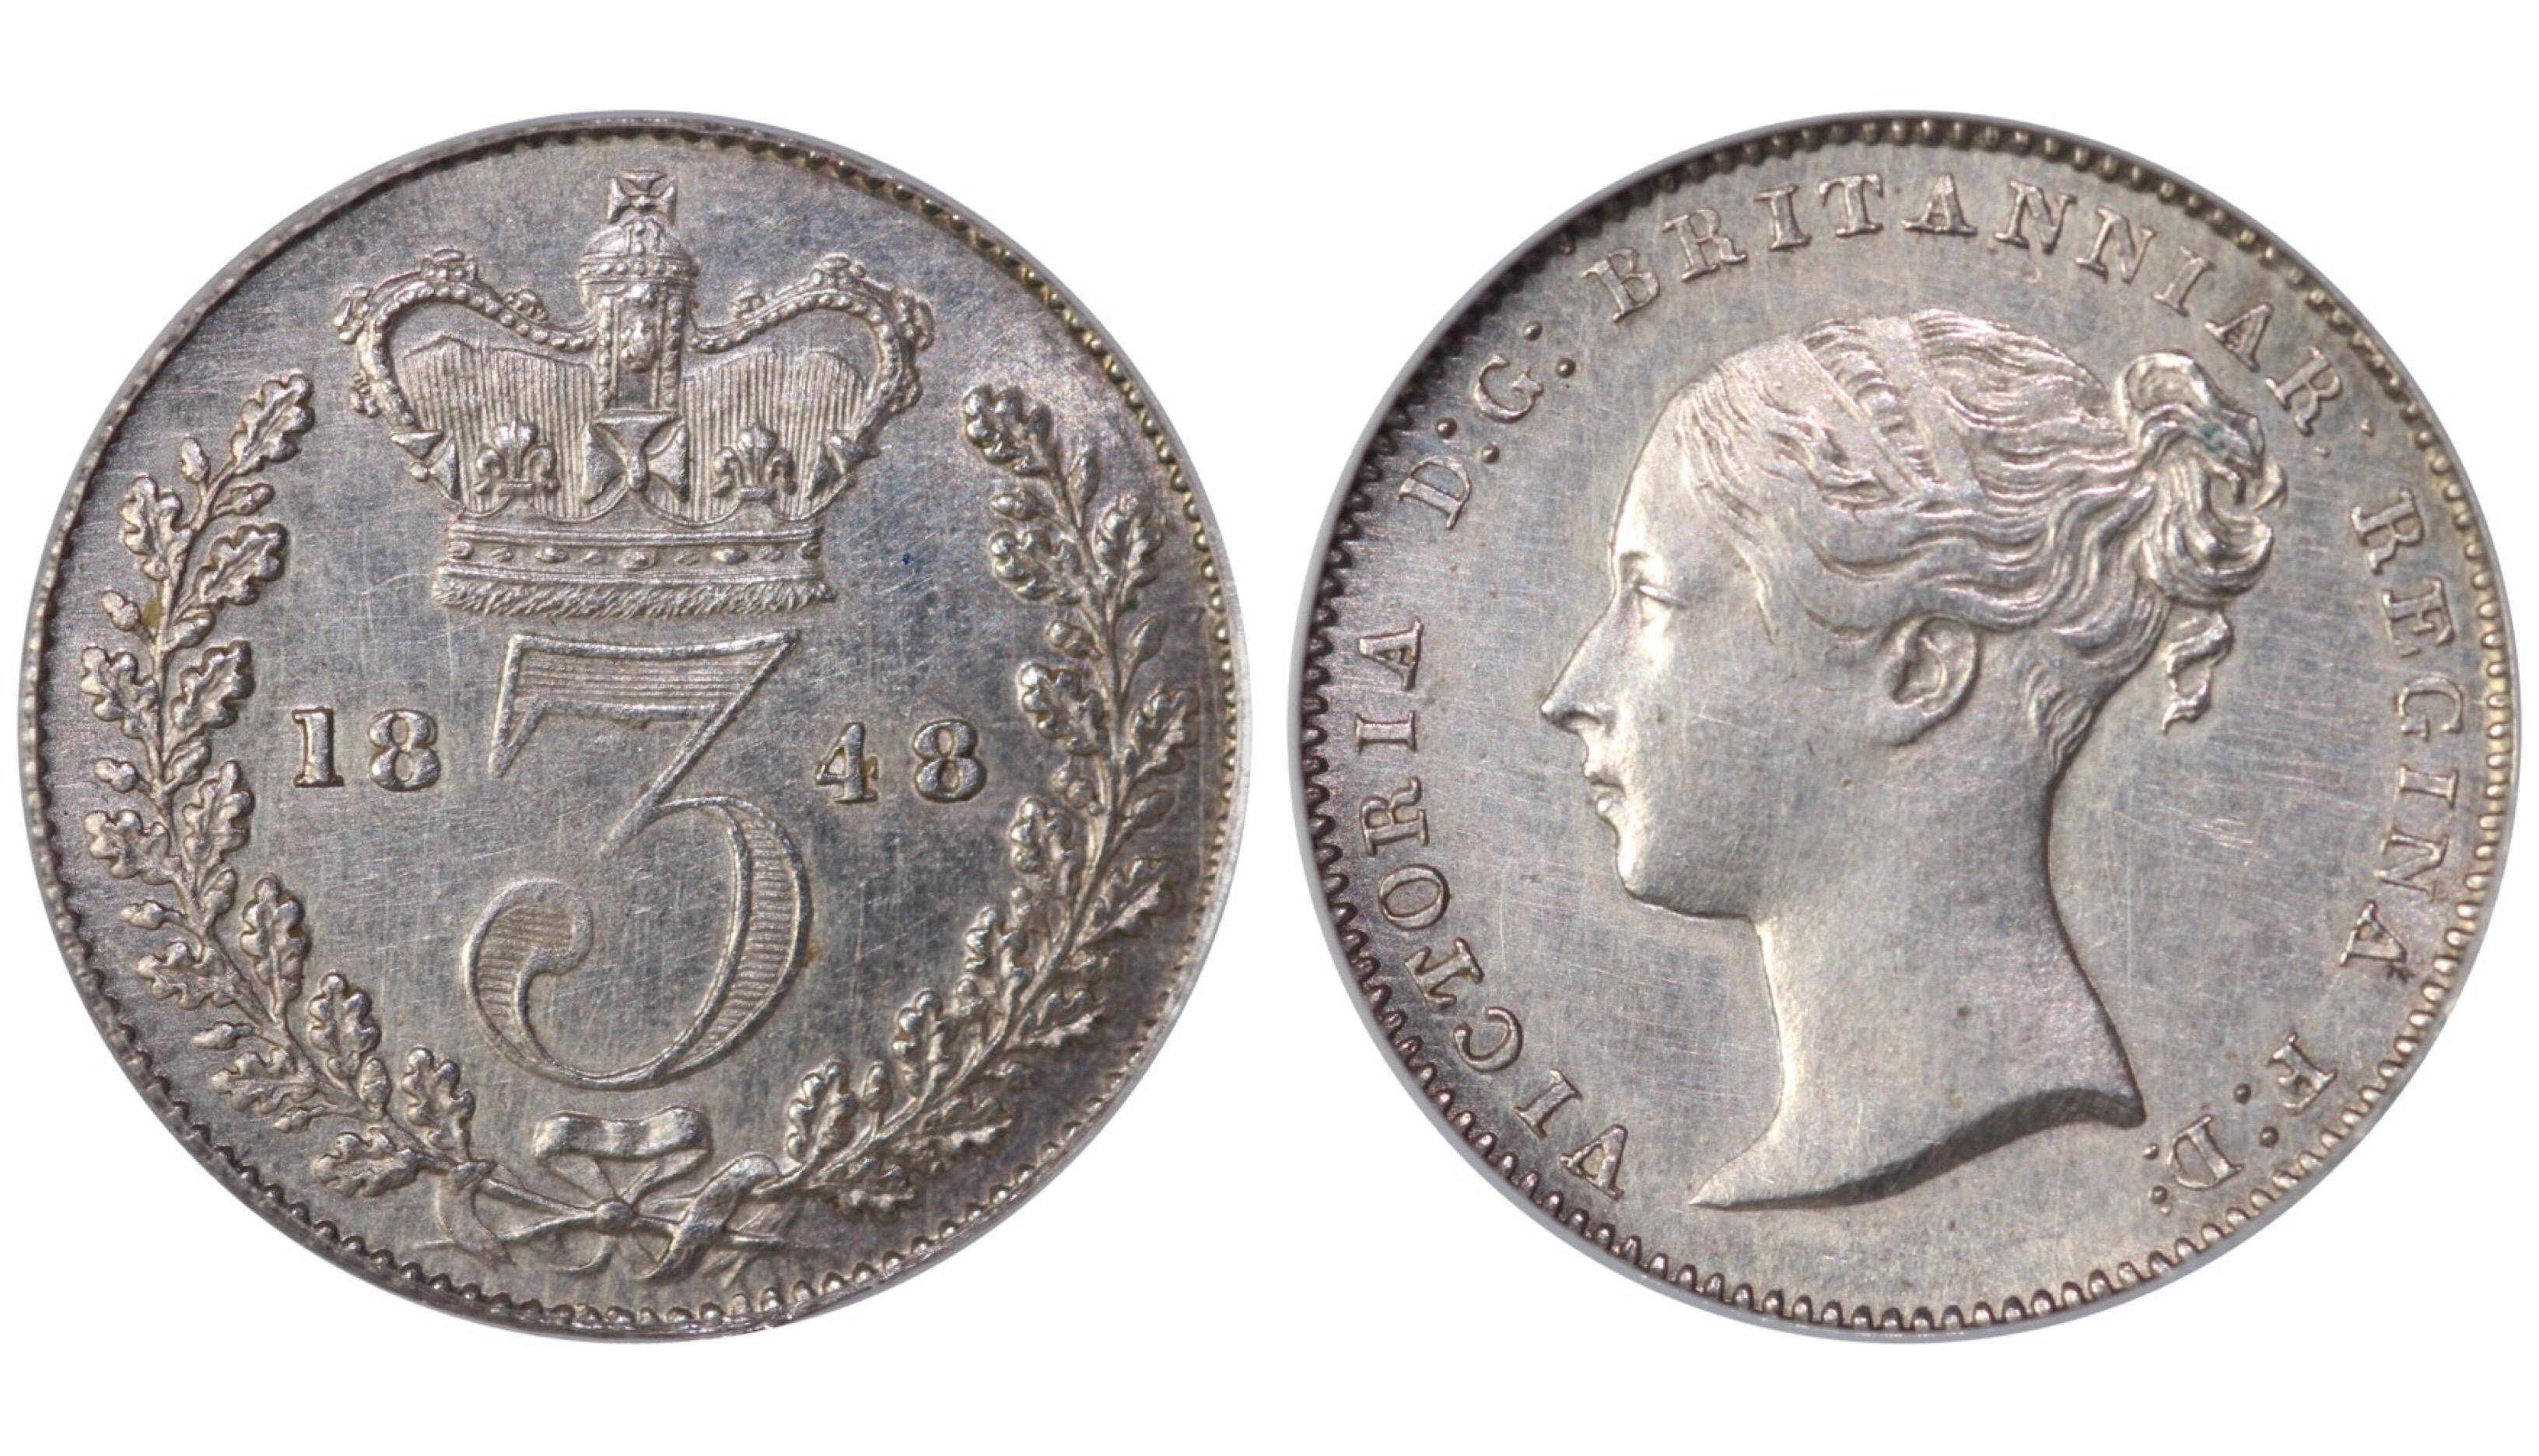 1848 Threepence, CGS 70(MS 60-61), aUNC, Victoria, ESC 2056A